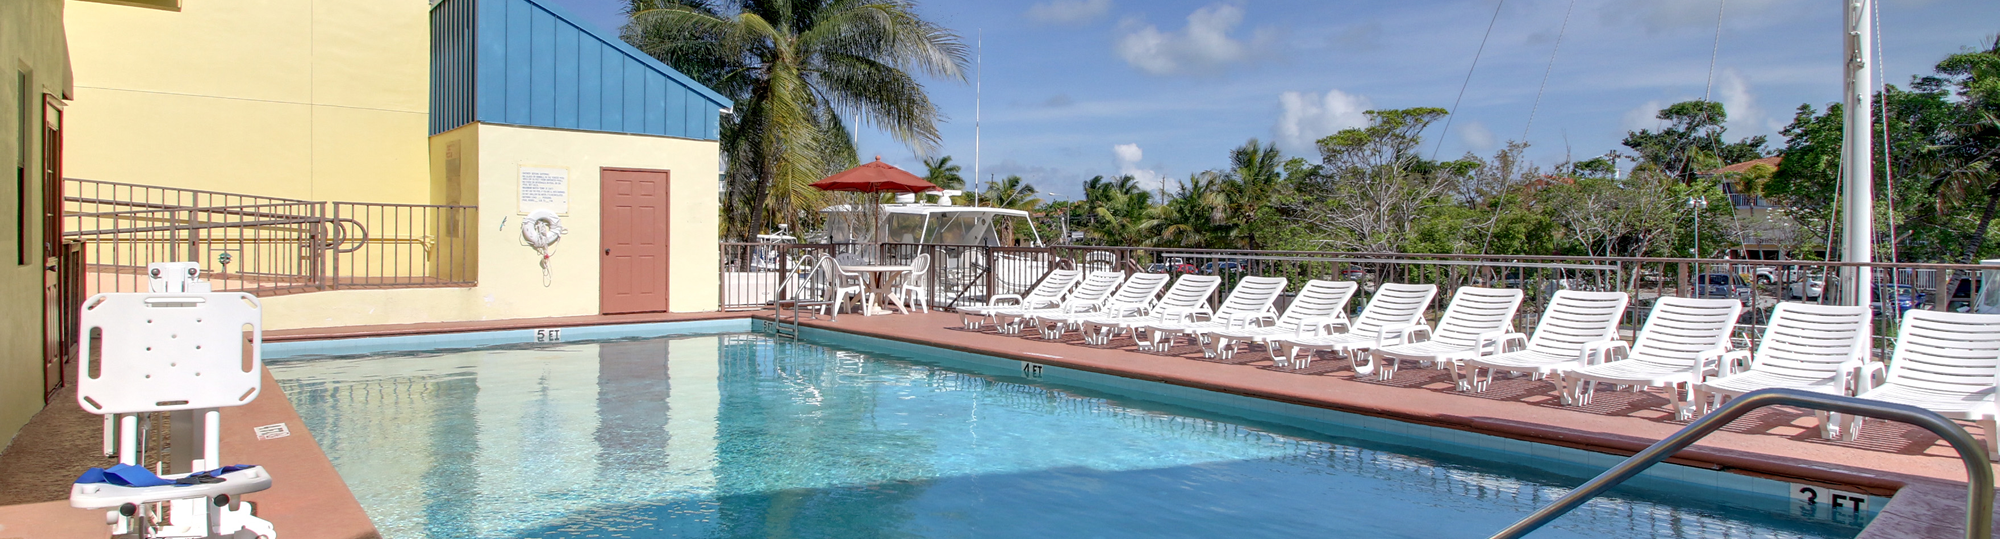 Key West Inn Hotels and Resorts Key Largo